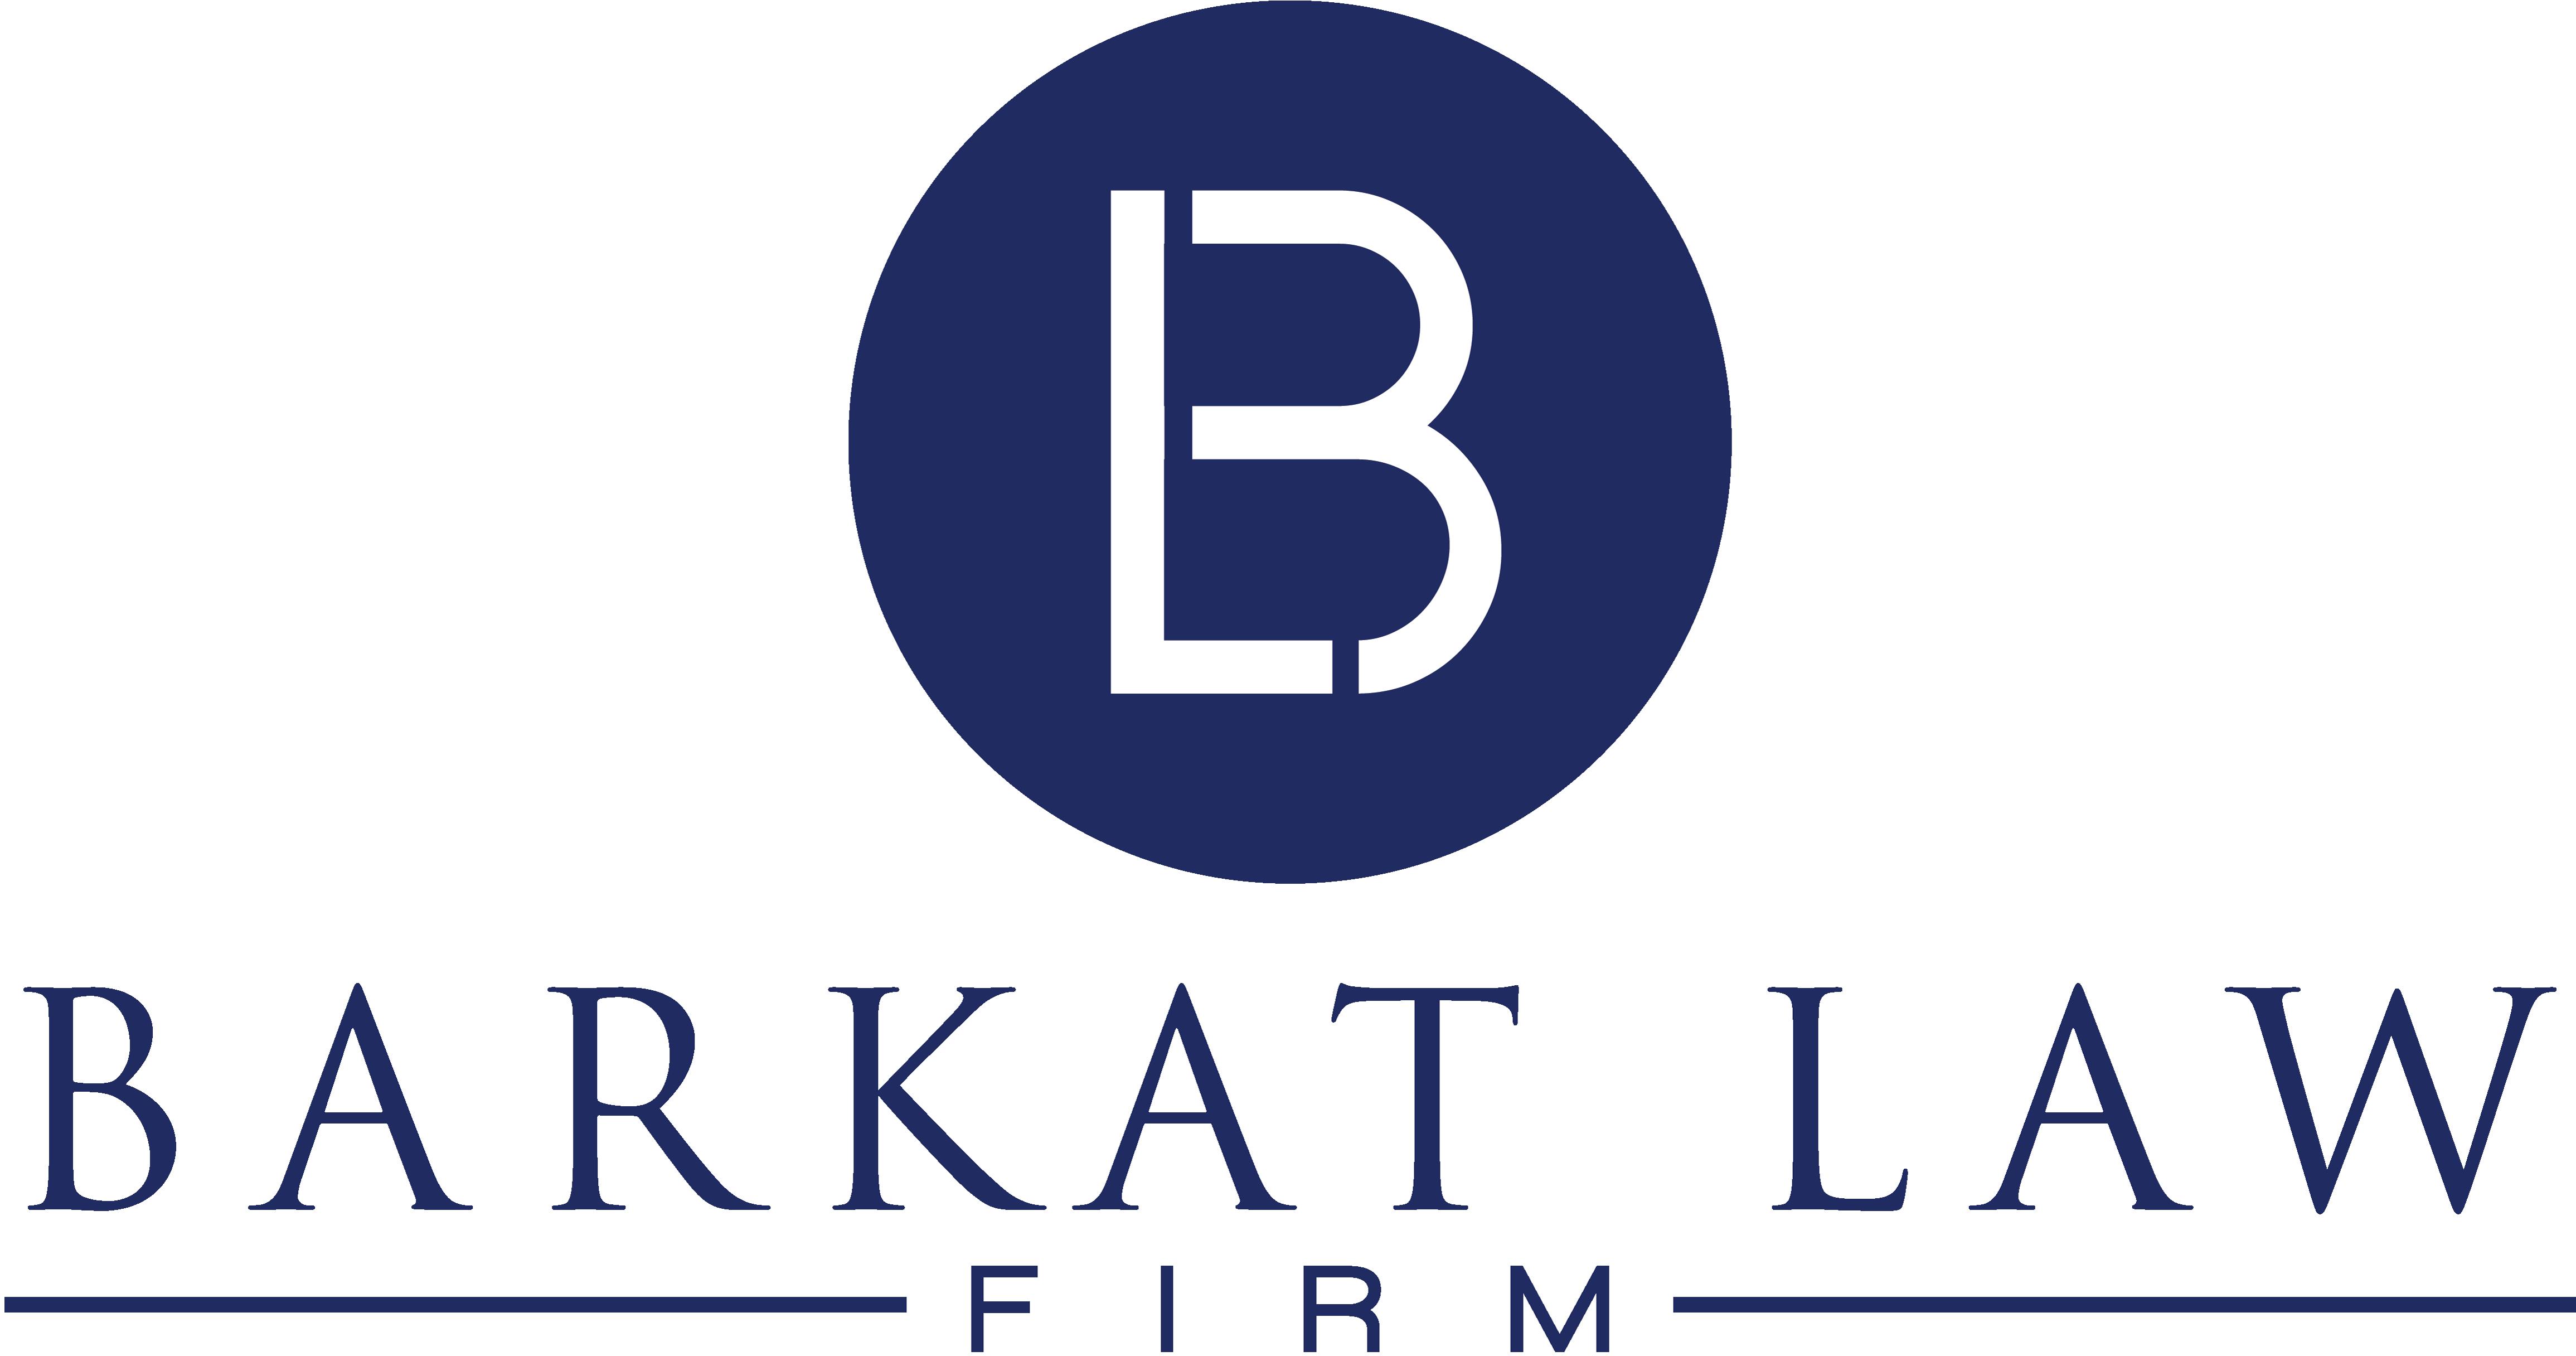 Barkat Law Firm Washington Dc Divorce Attorney